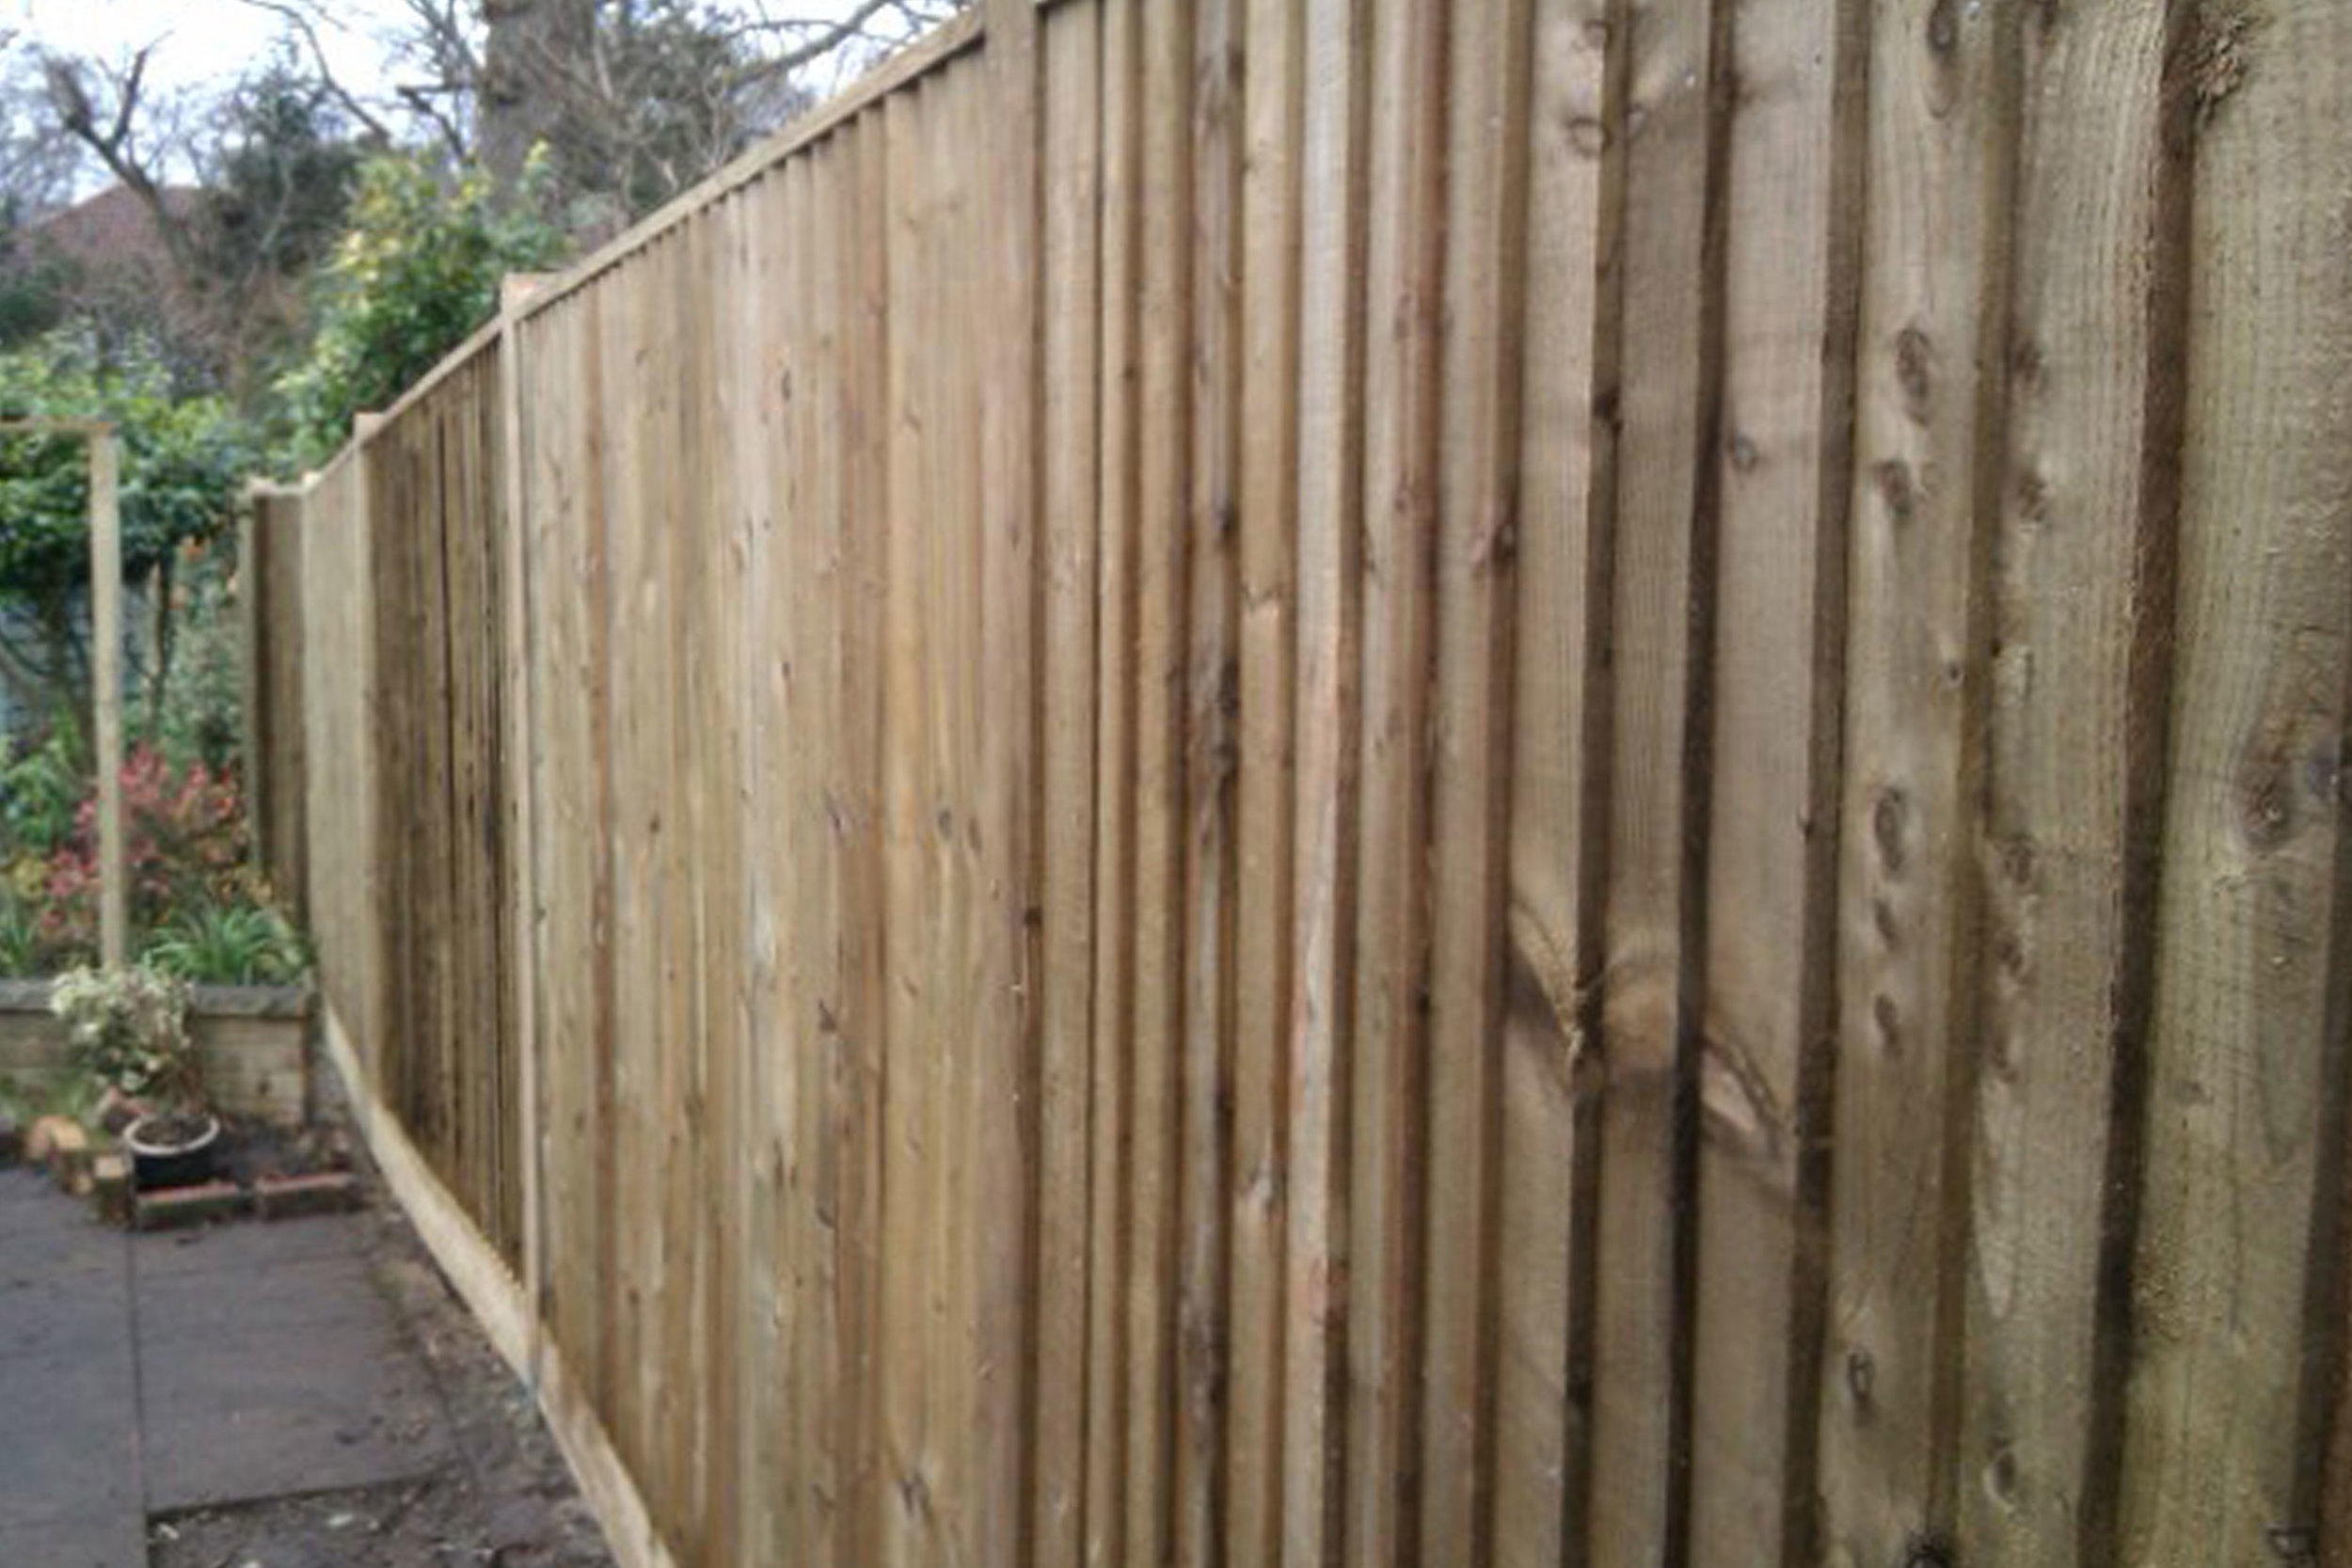 Fence_4.jpg